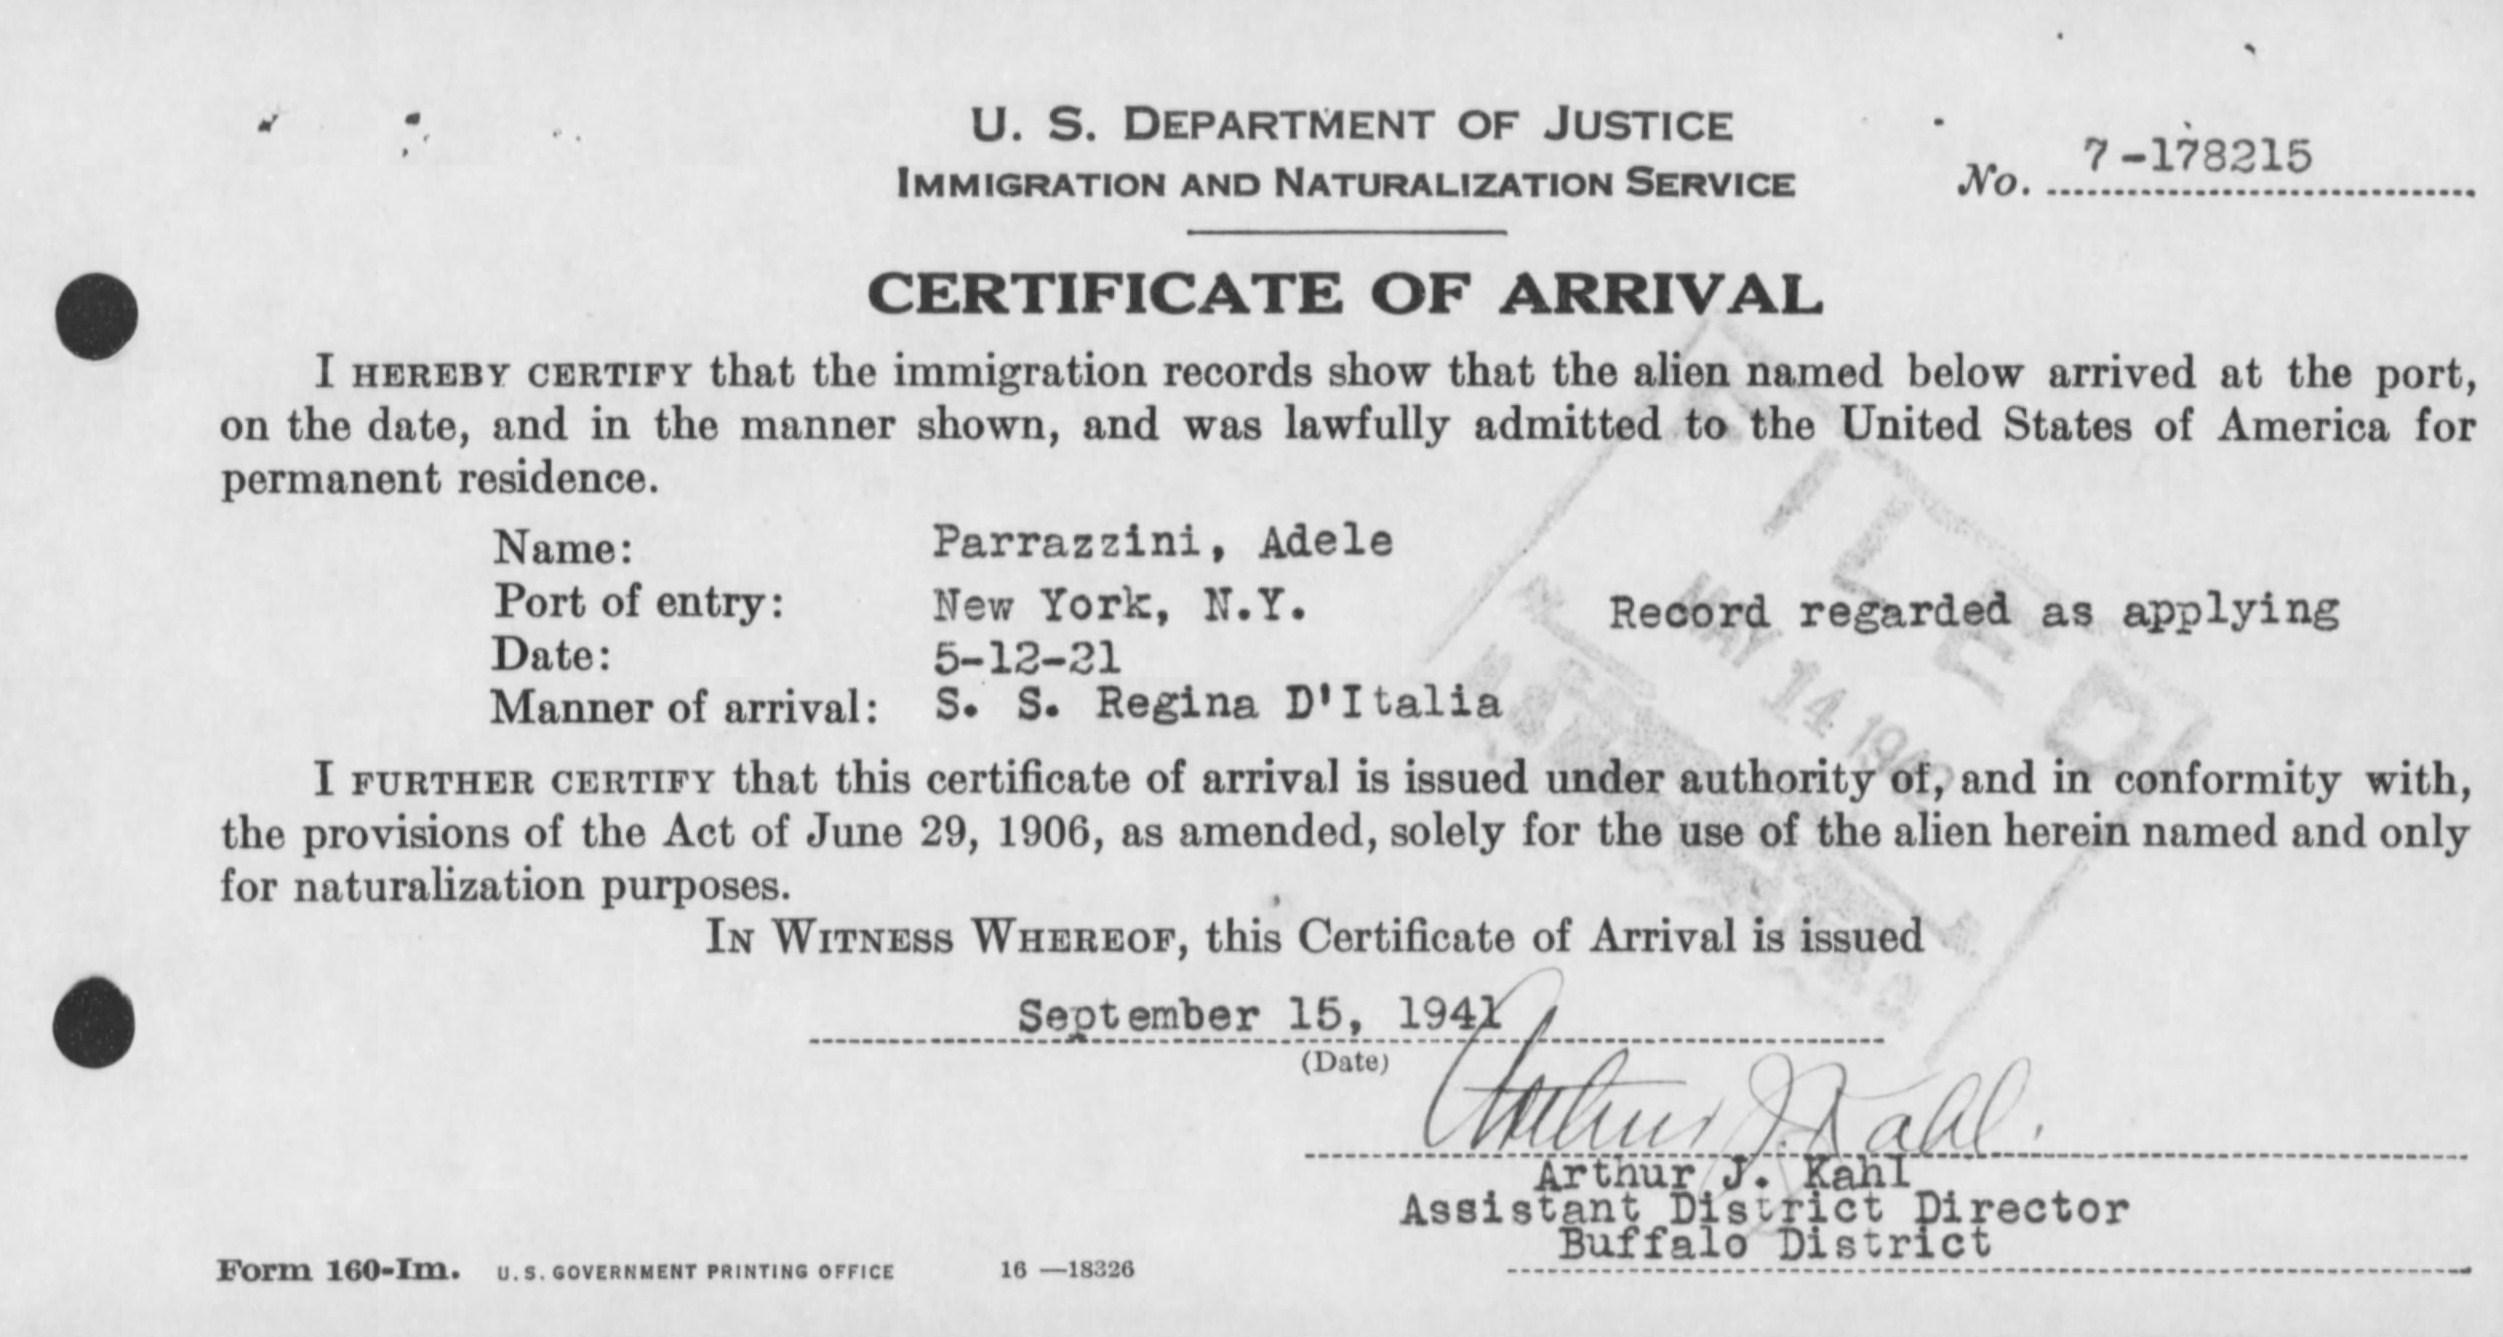 Licciardi Family Documents - The Spiraling Chains: Kowalski